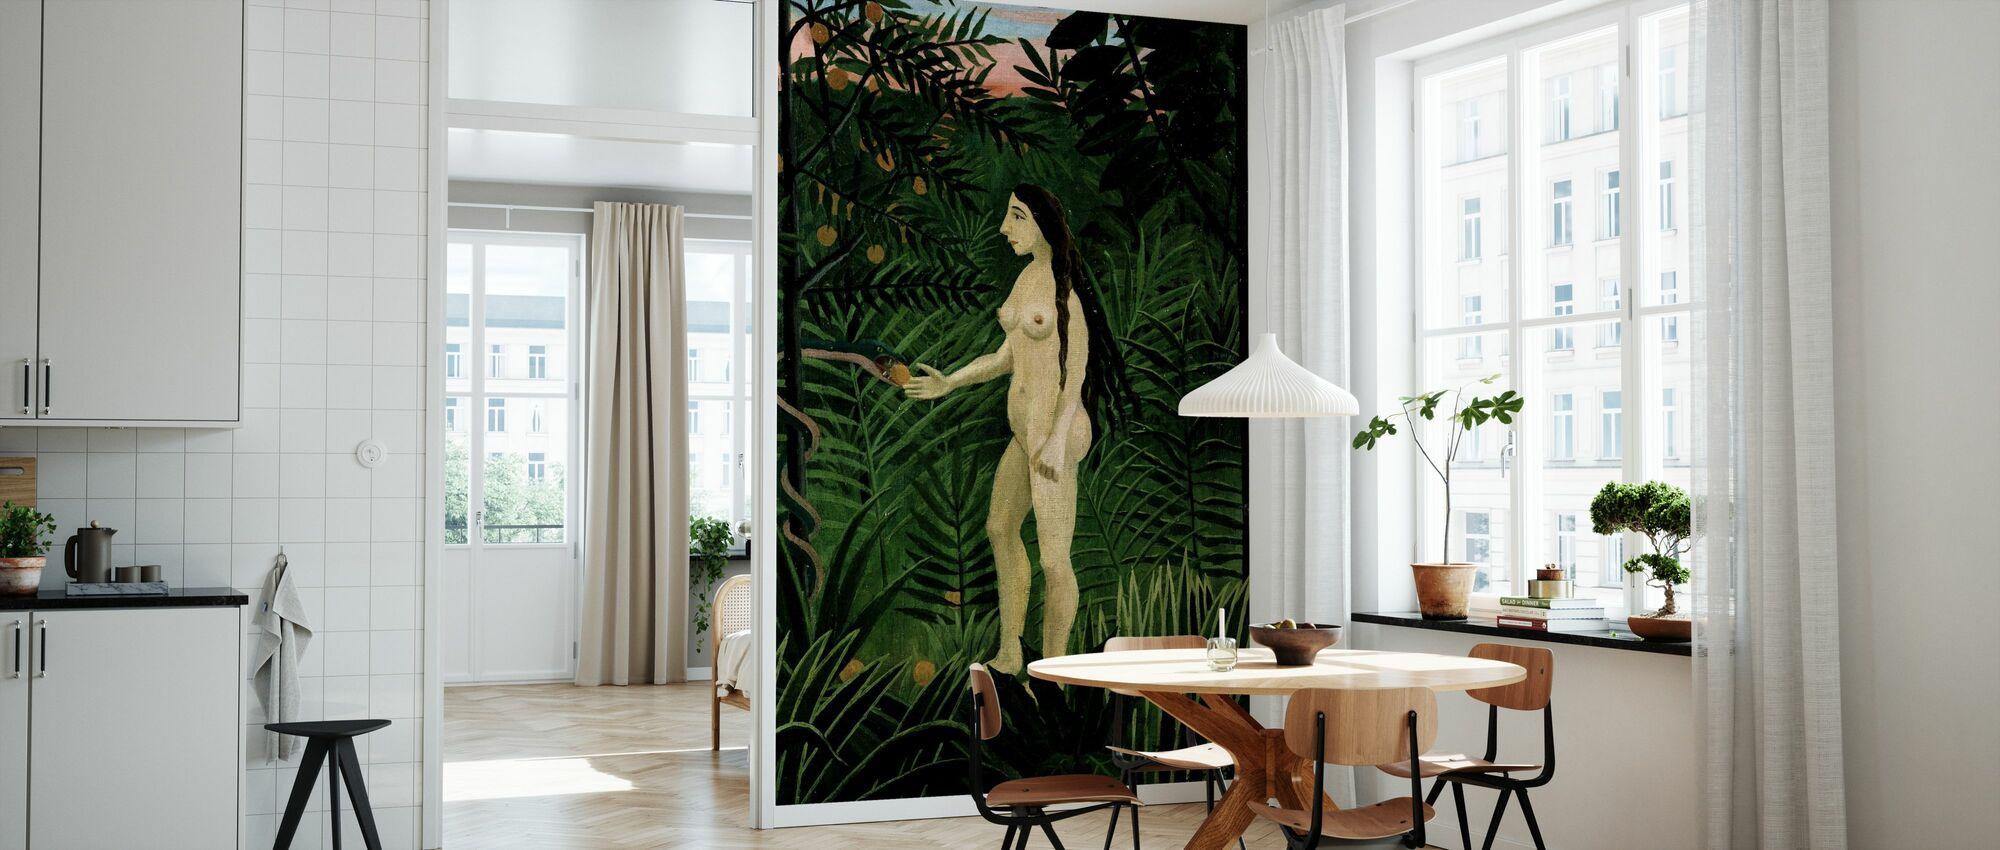 Eve, Henri Rousseau - Wallpaper - Kitchen